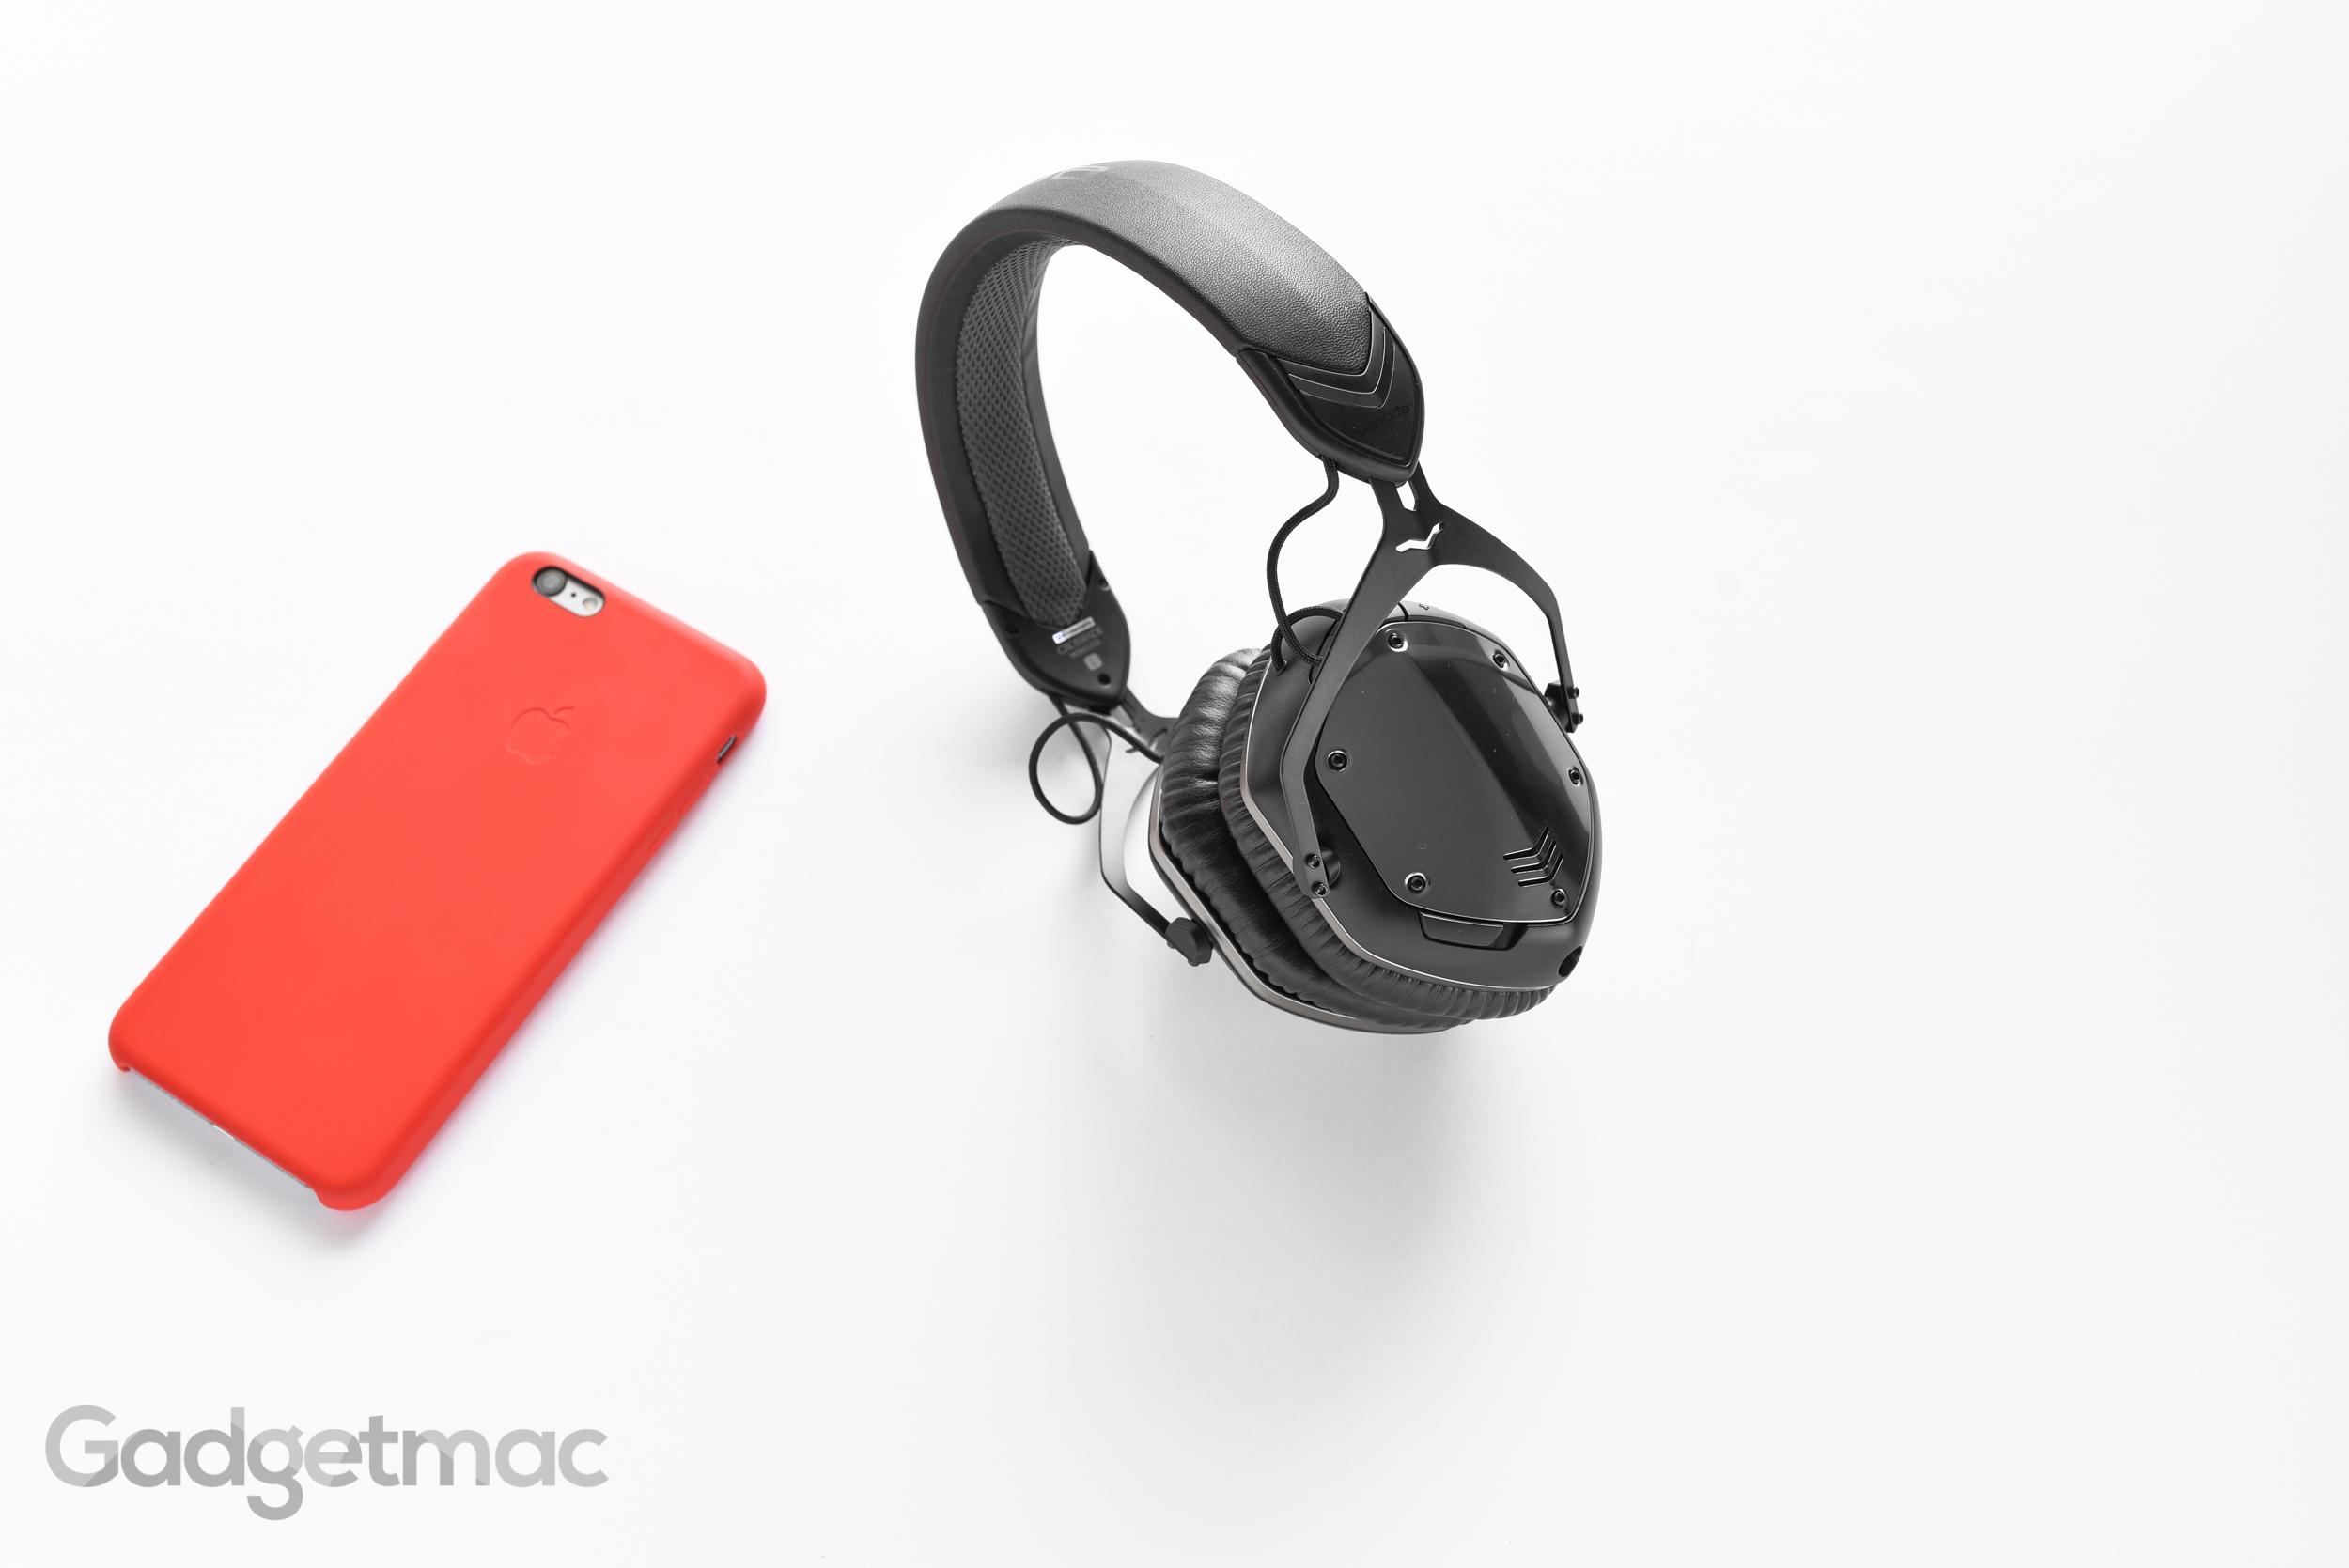 v-moda-crossfade-wireless-headphones.jpg